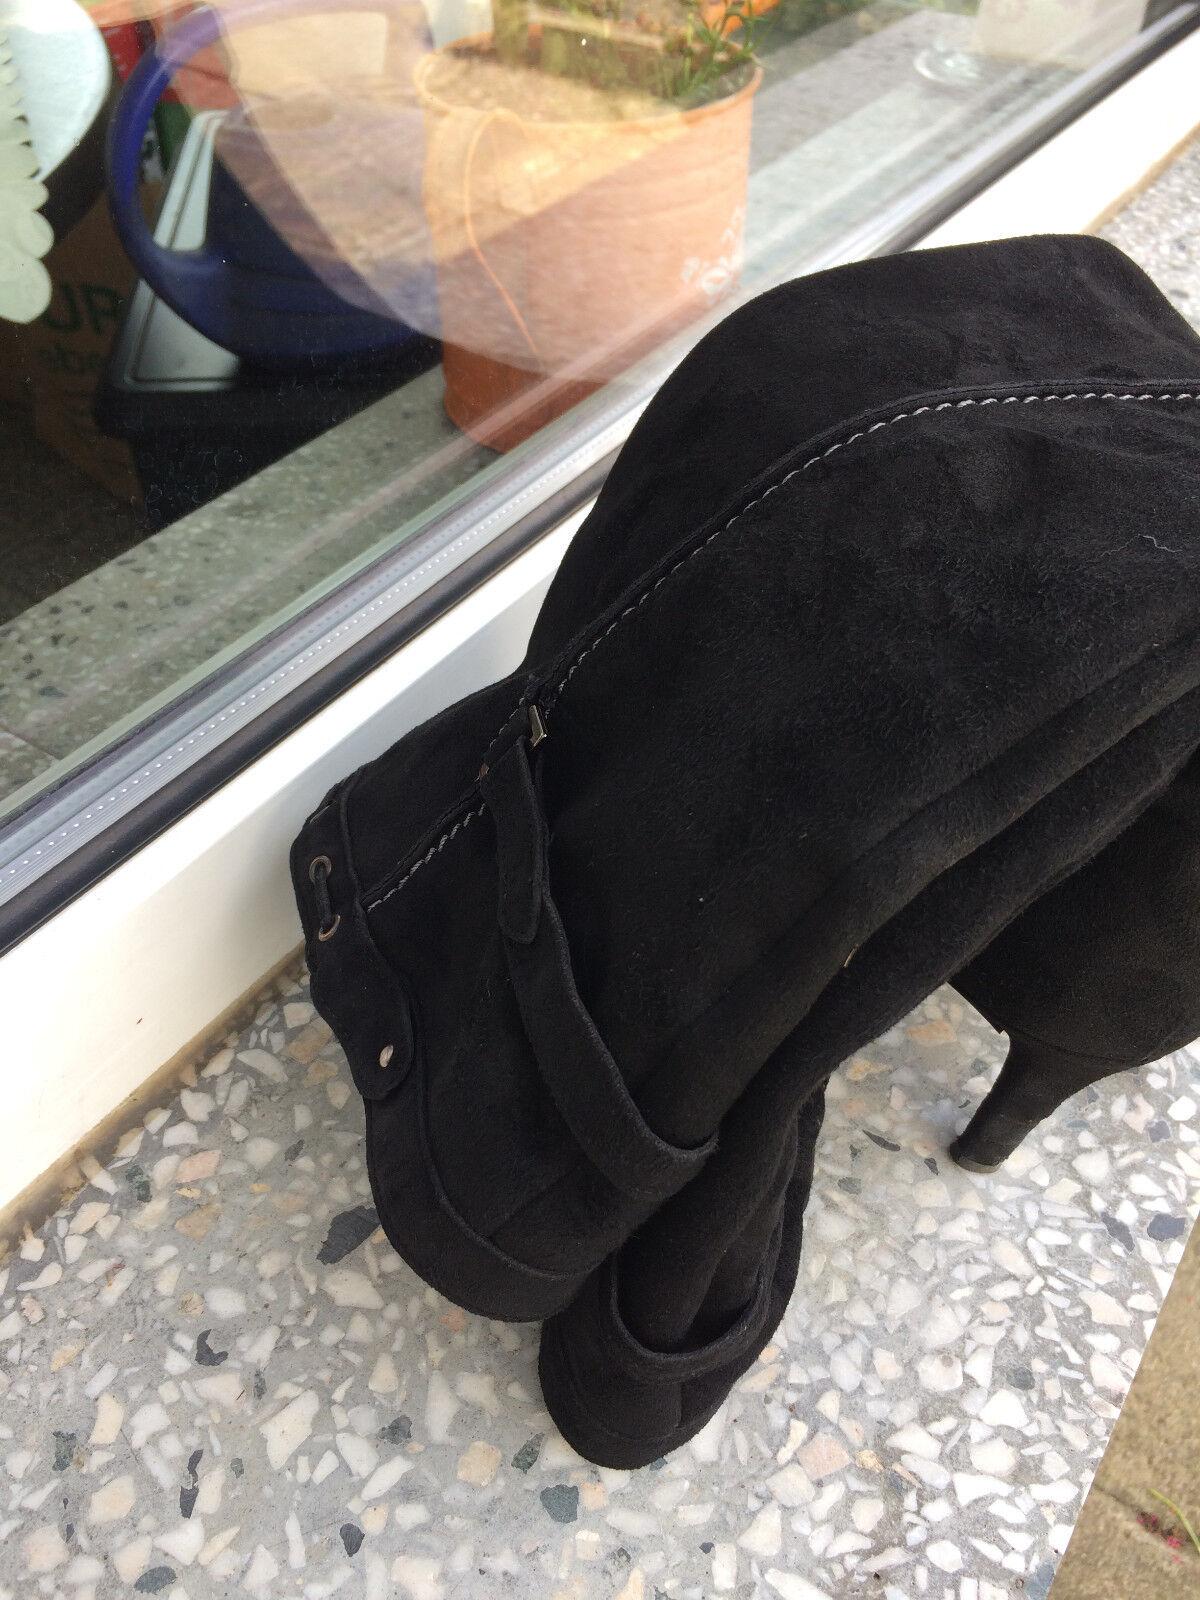 Top Schwarze Pura Lopez Damenstiefel Damenstiefel Damenstiefel ,Gr 7 23bdc9